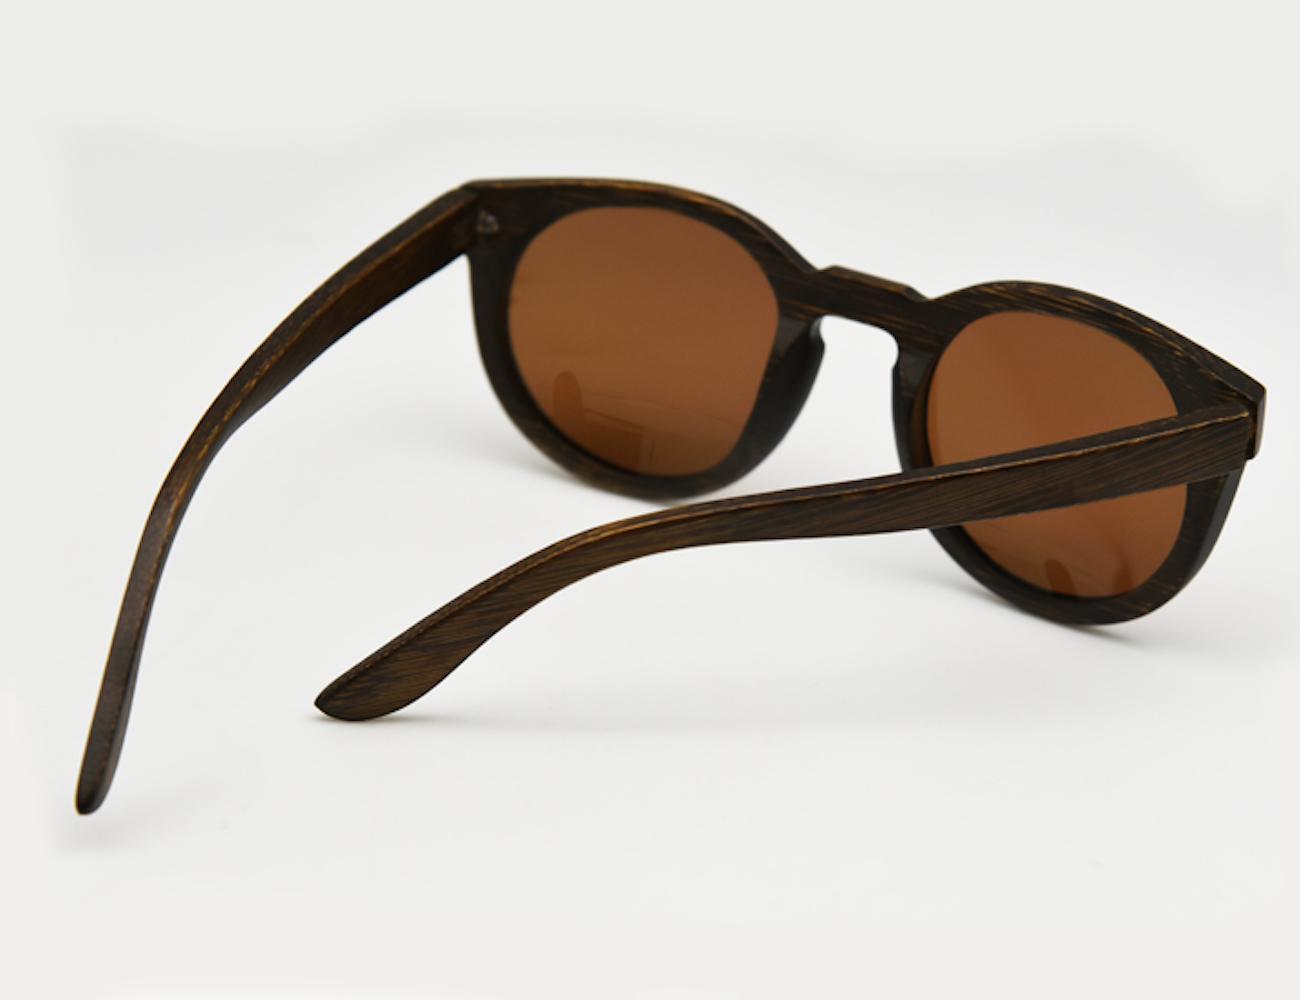 Vintage Wooden Sunglasses